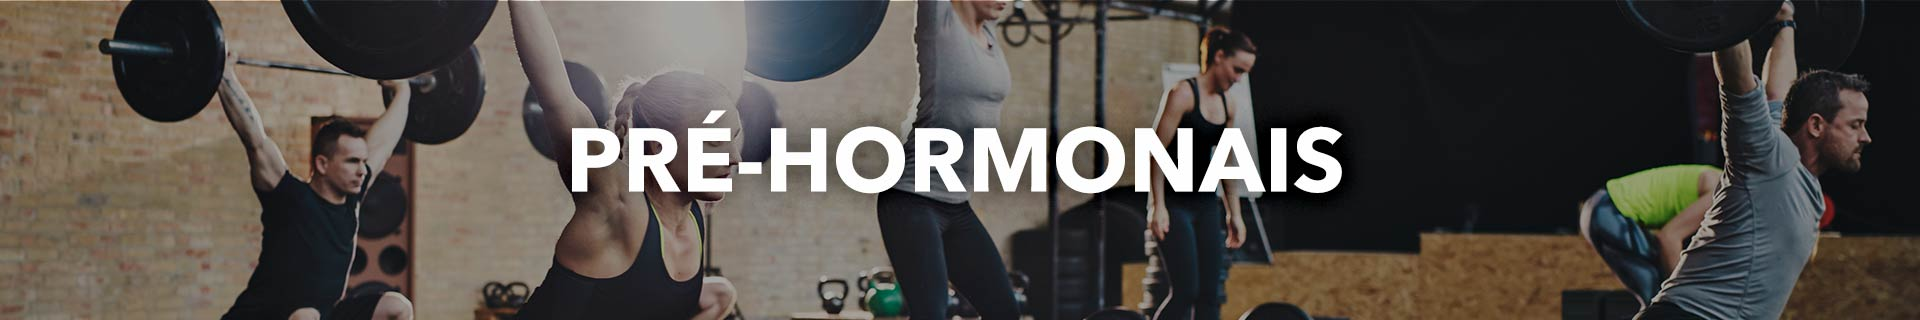 Pré-Hormonais